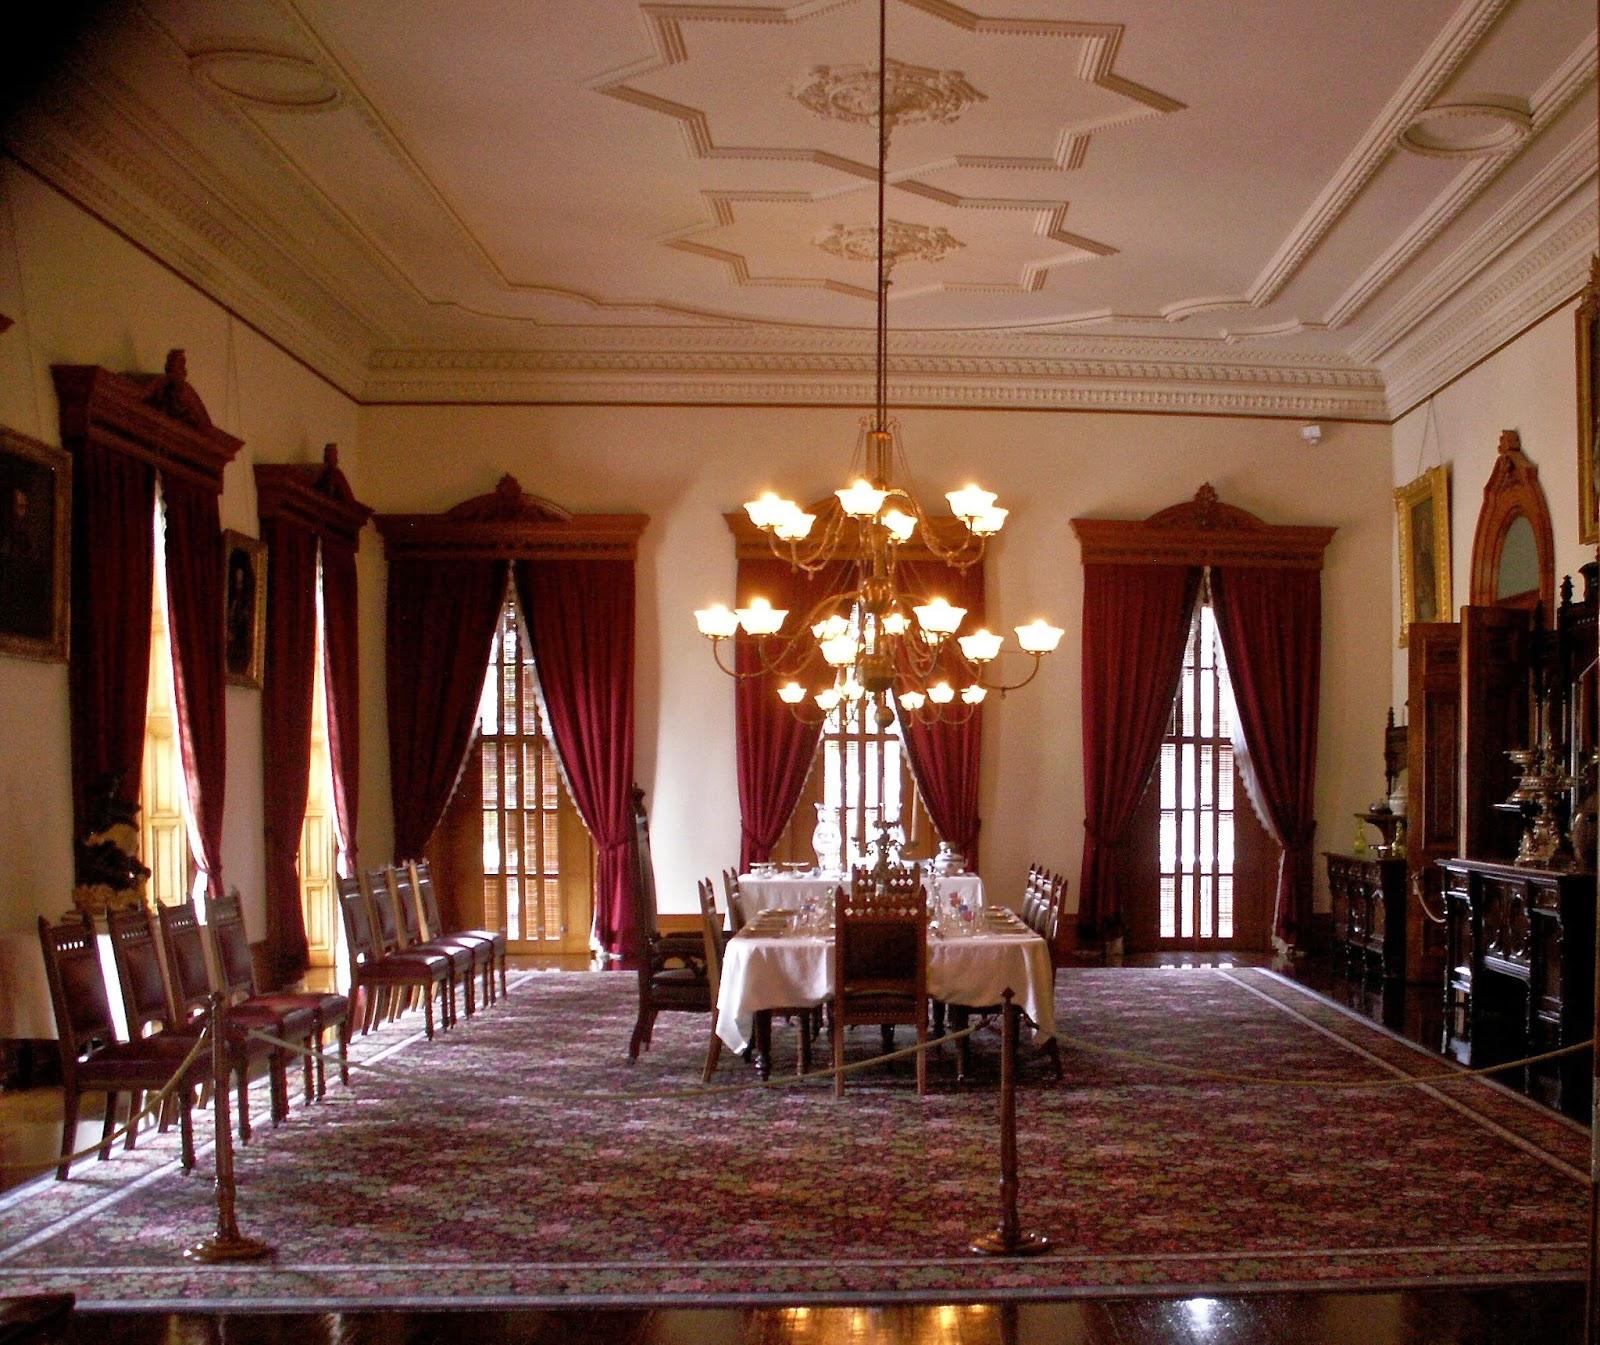 Travel Rocks My World: Iolani Palace, Hawaii's Gilded Age